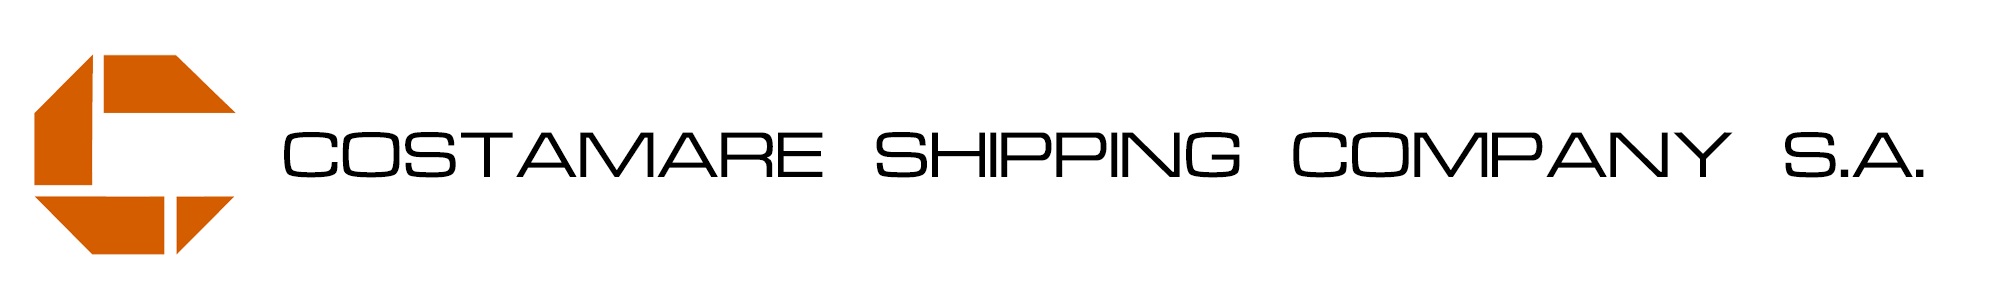 COSTAMARE SHIPPING COMPANY S.A.